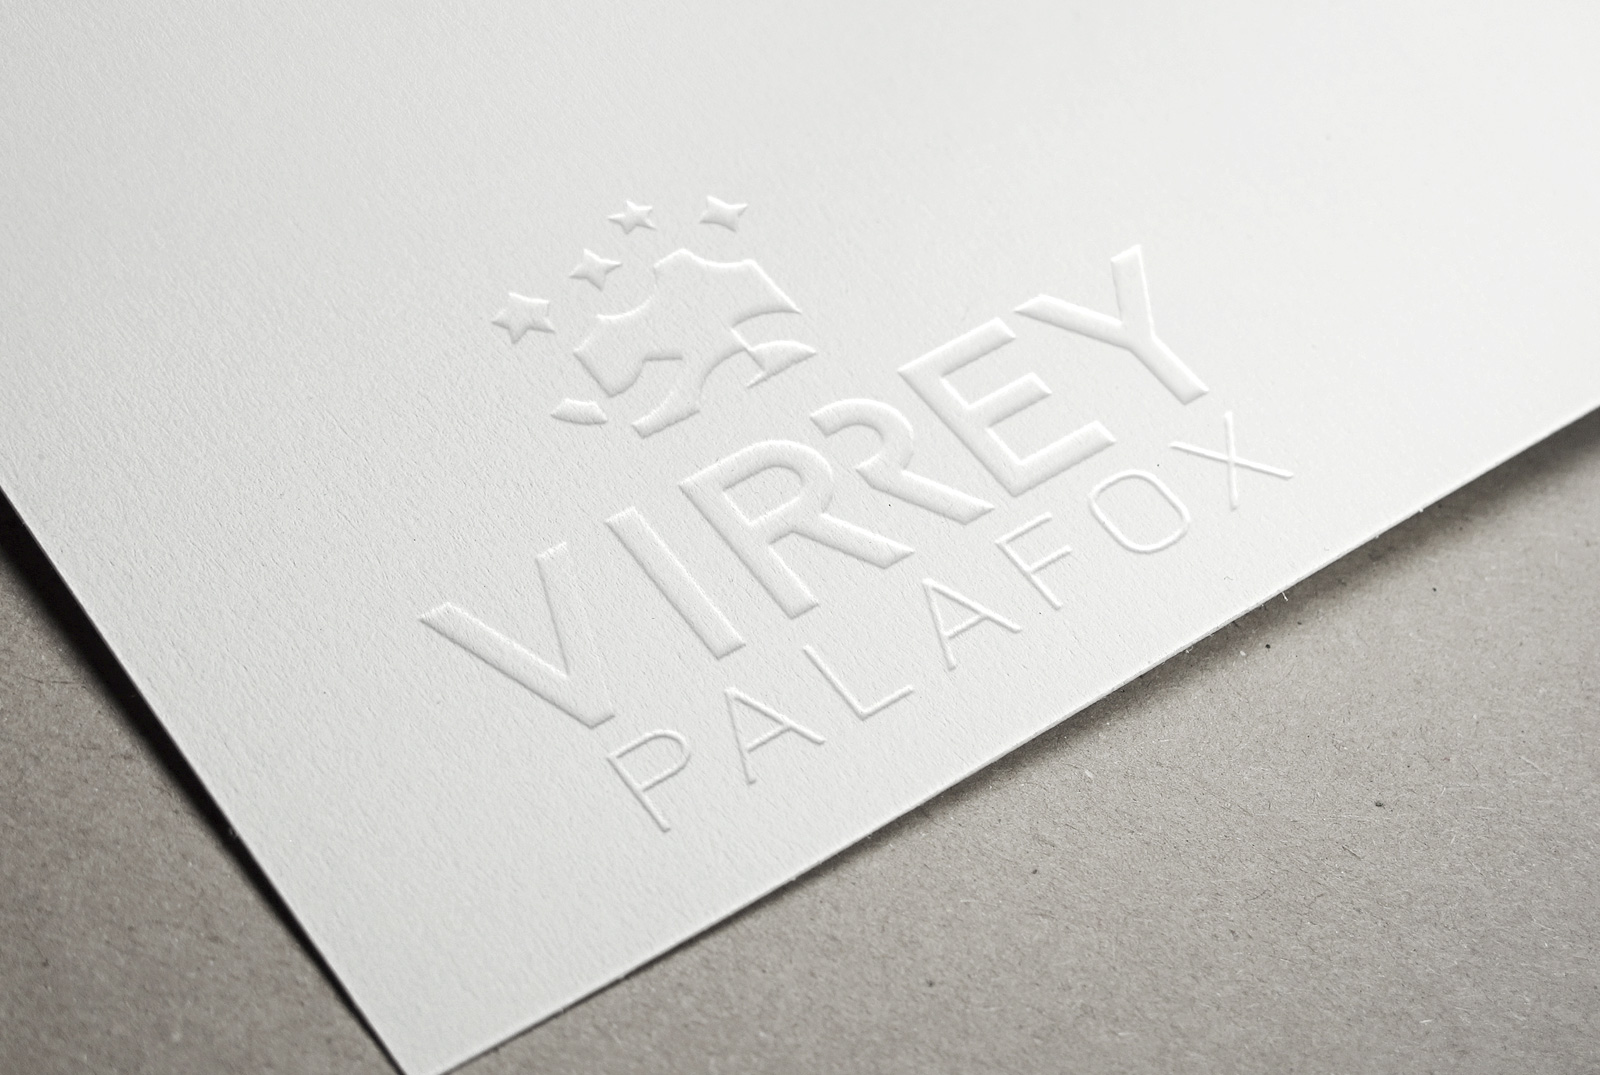 Virrey_Palafox_2